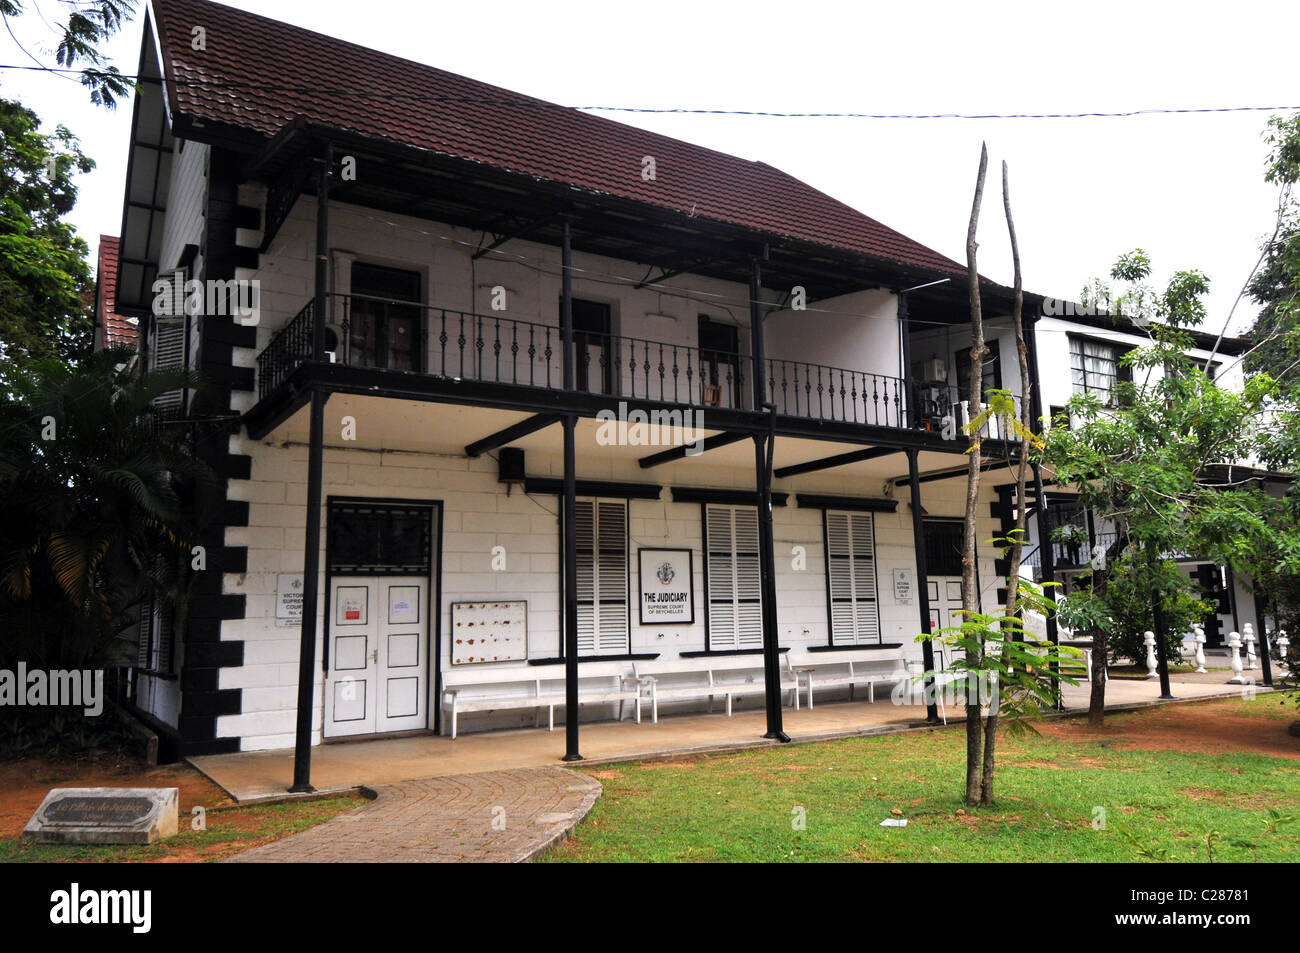 Court building, Mahe, Seychelles - Stock Image